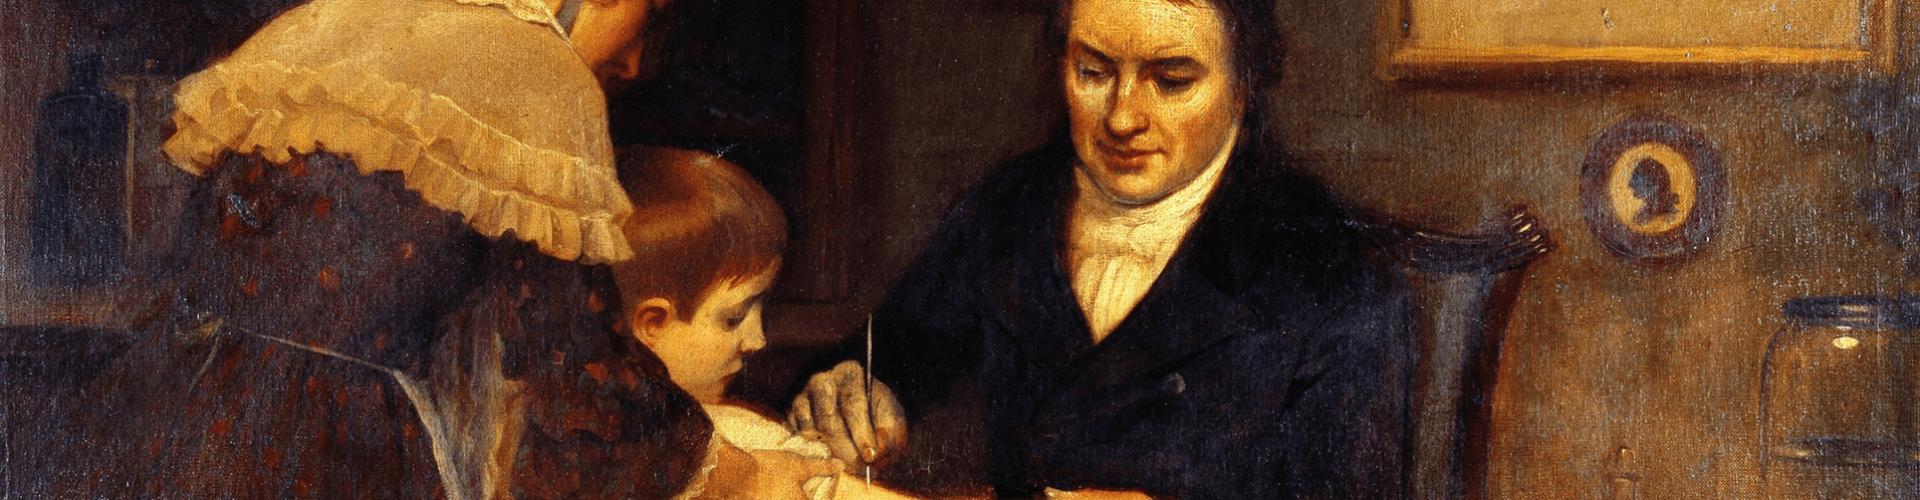 Dióhéjban a vakcináról